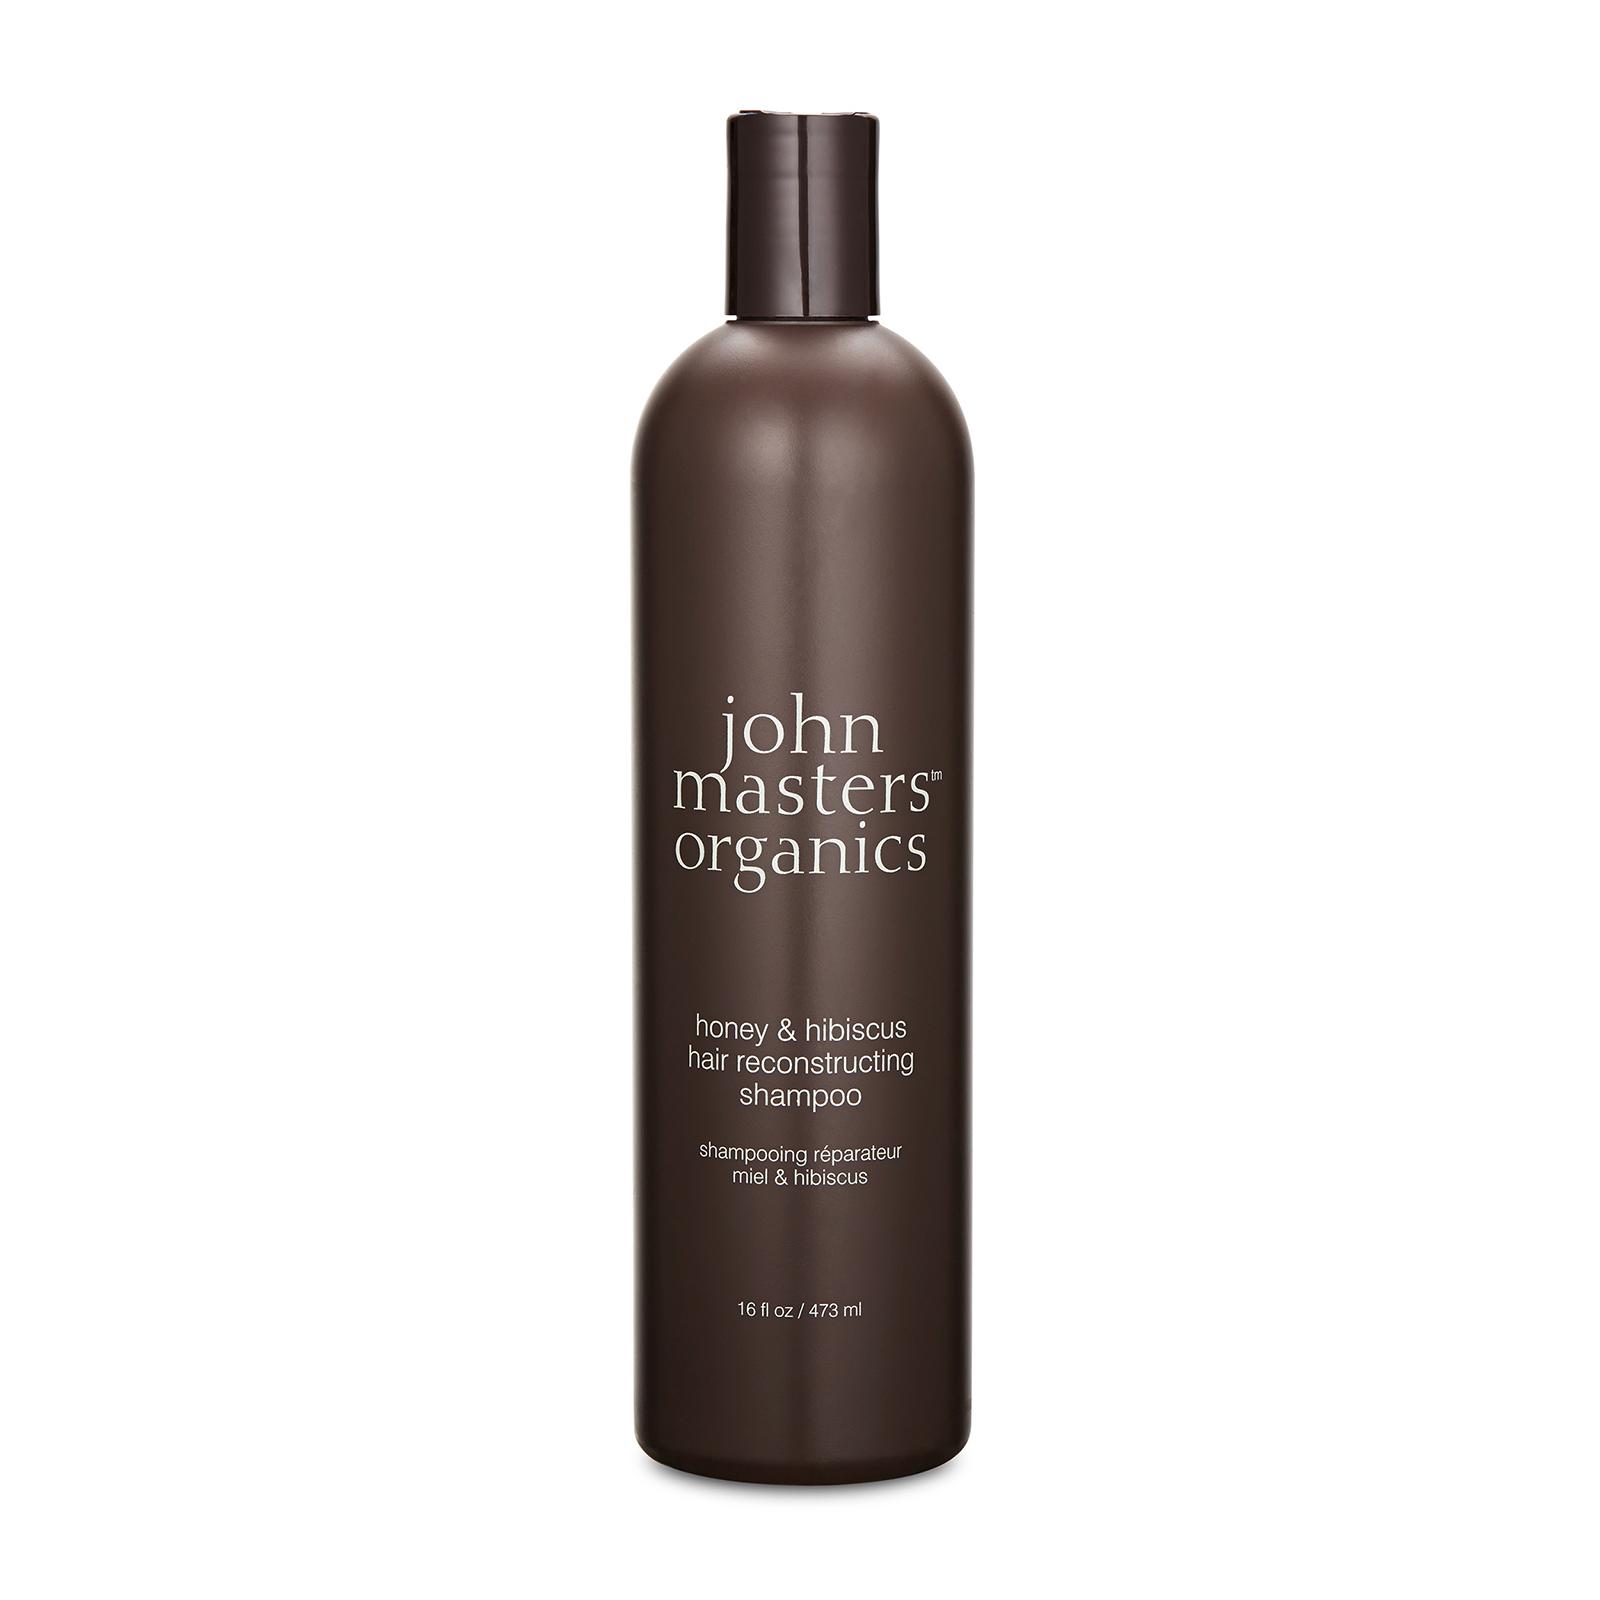 John Masters Organics  Honey & Hibiscus Hair Reconstructing Shampoo 16oz, 473ml